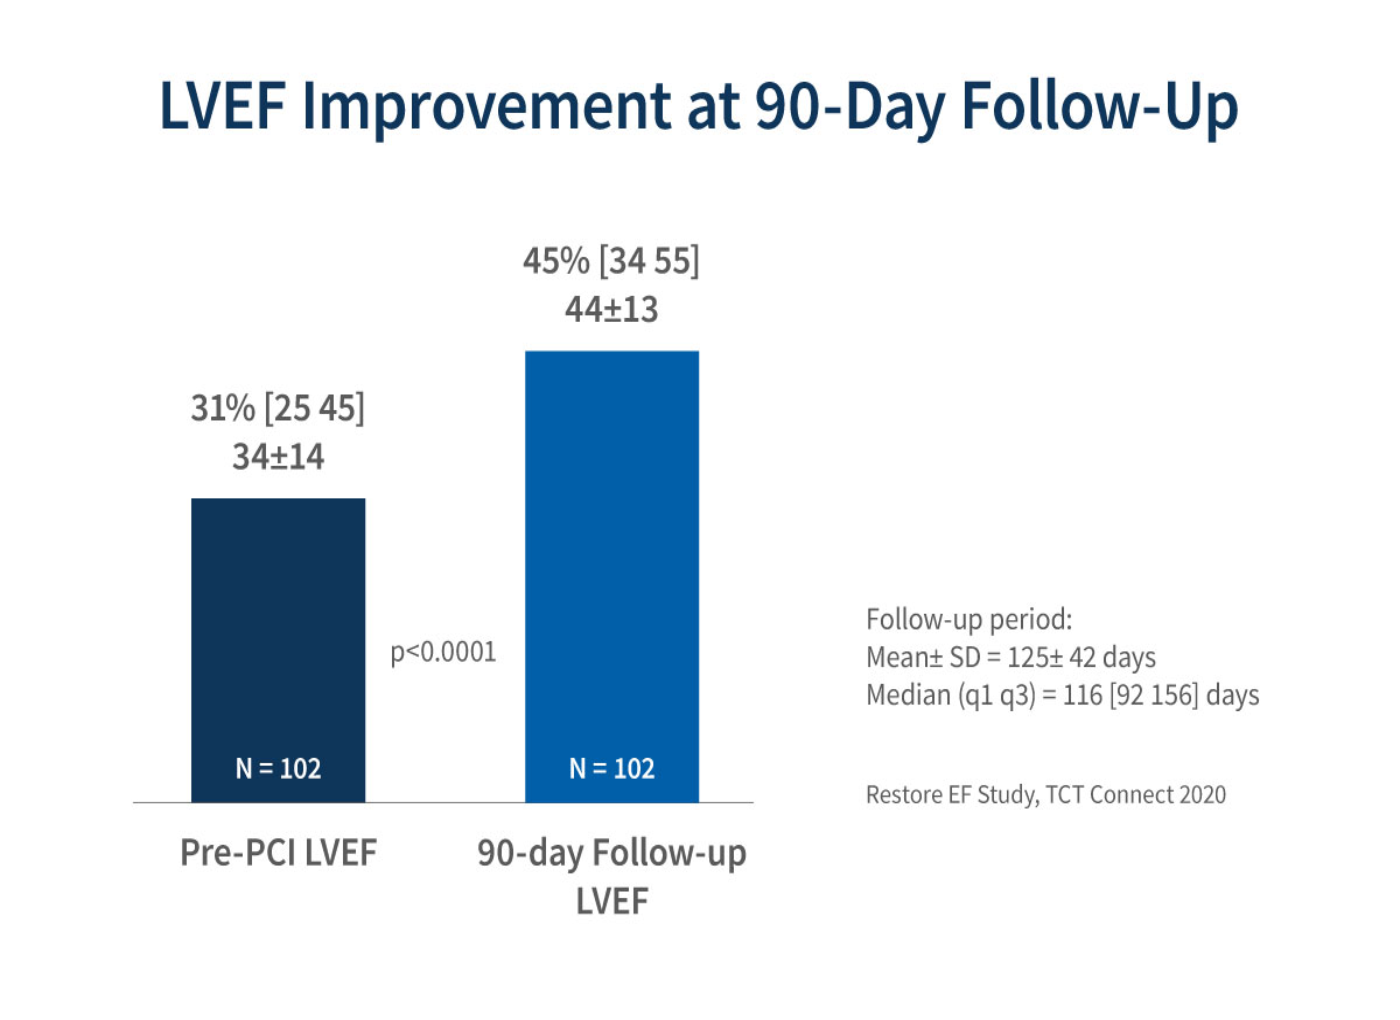 Chart of LVEF Improvement at 90-day follow up